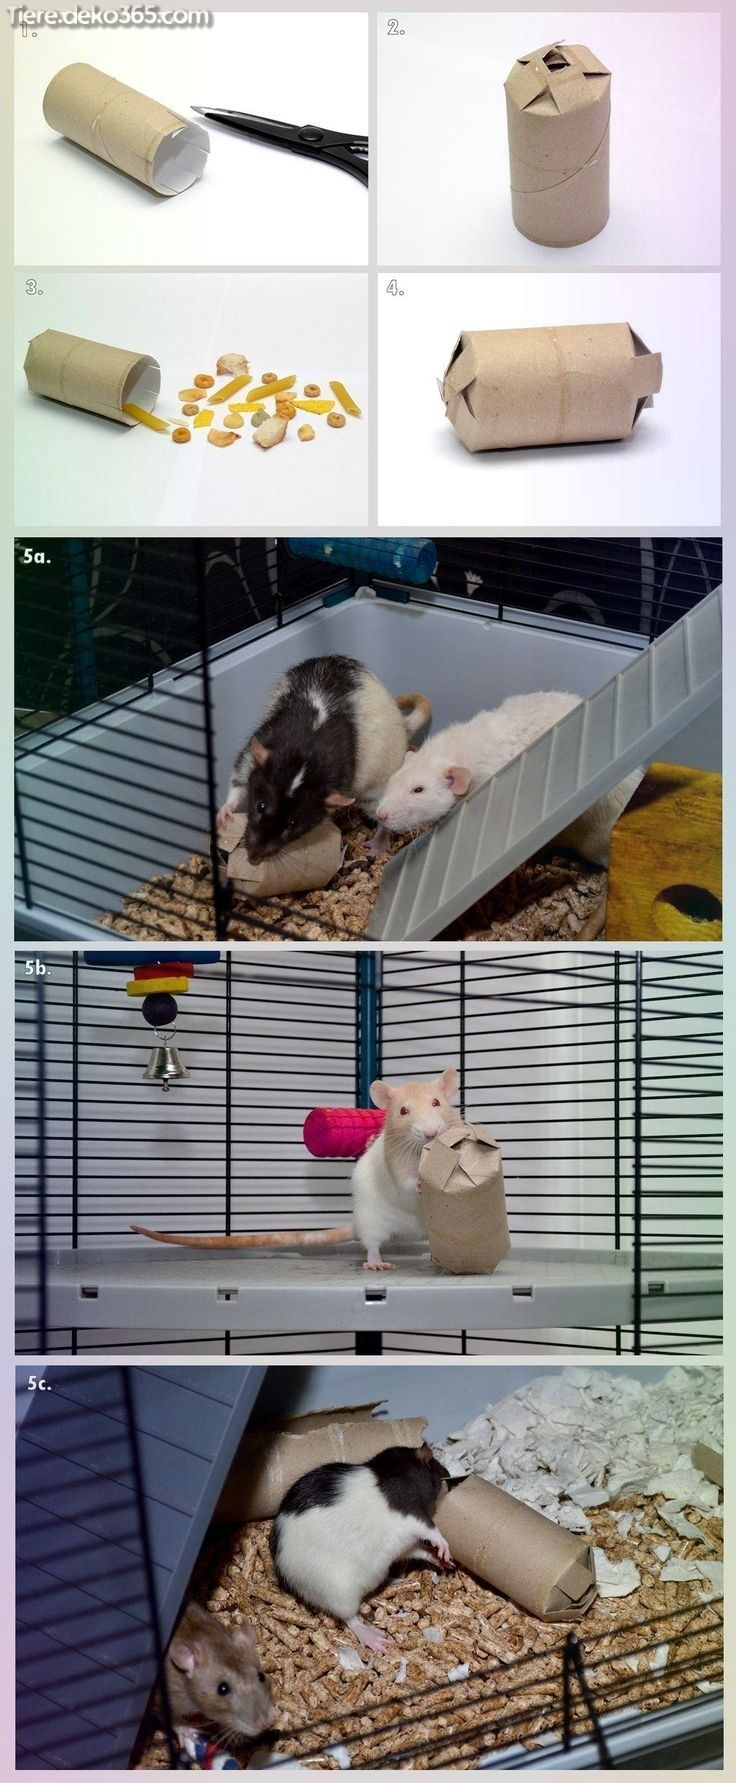 Tolle Die Lustige Ratte Aus Haustier Und Kafig Rat Toys Diy Rat Toys Hamster Toys